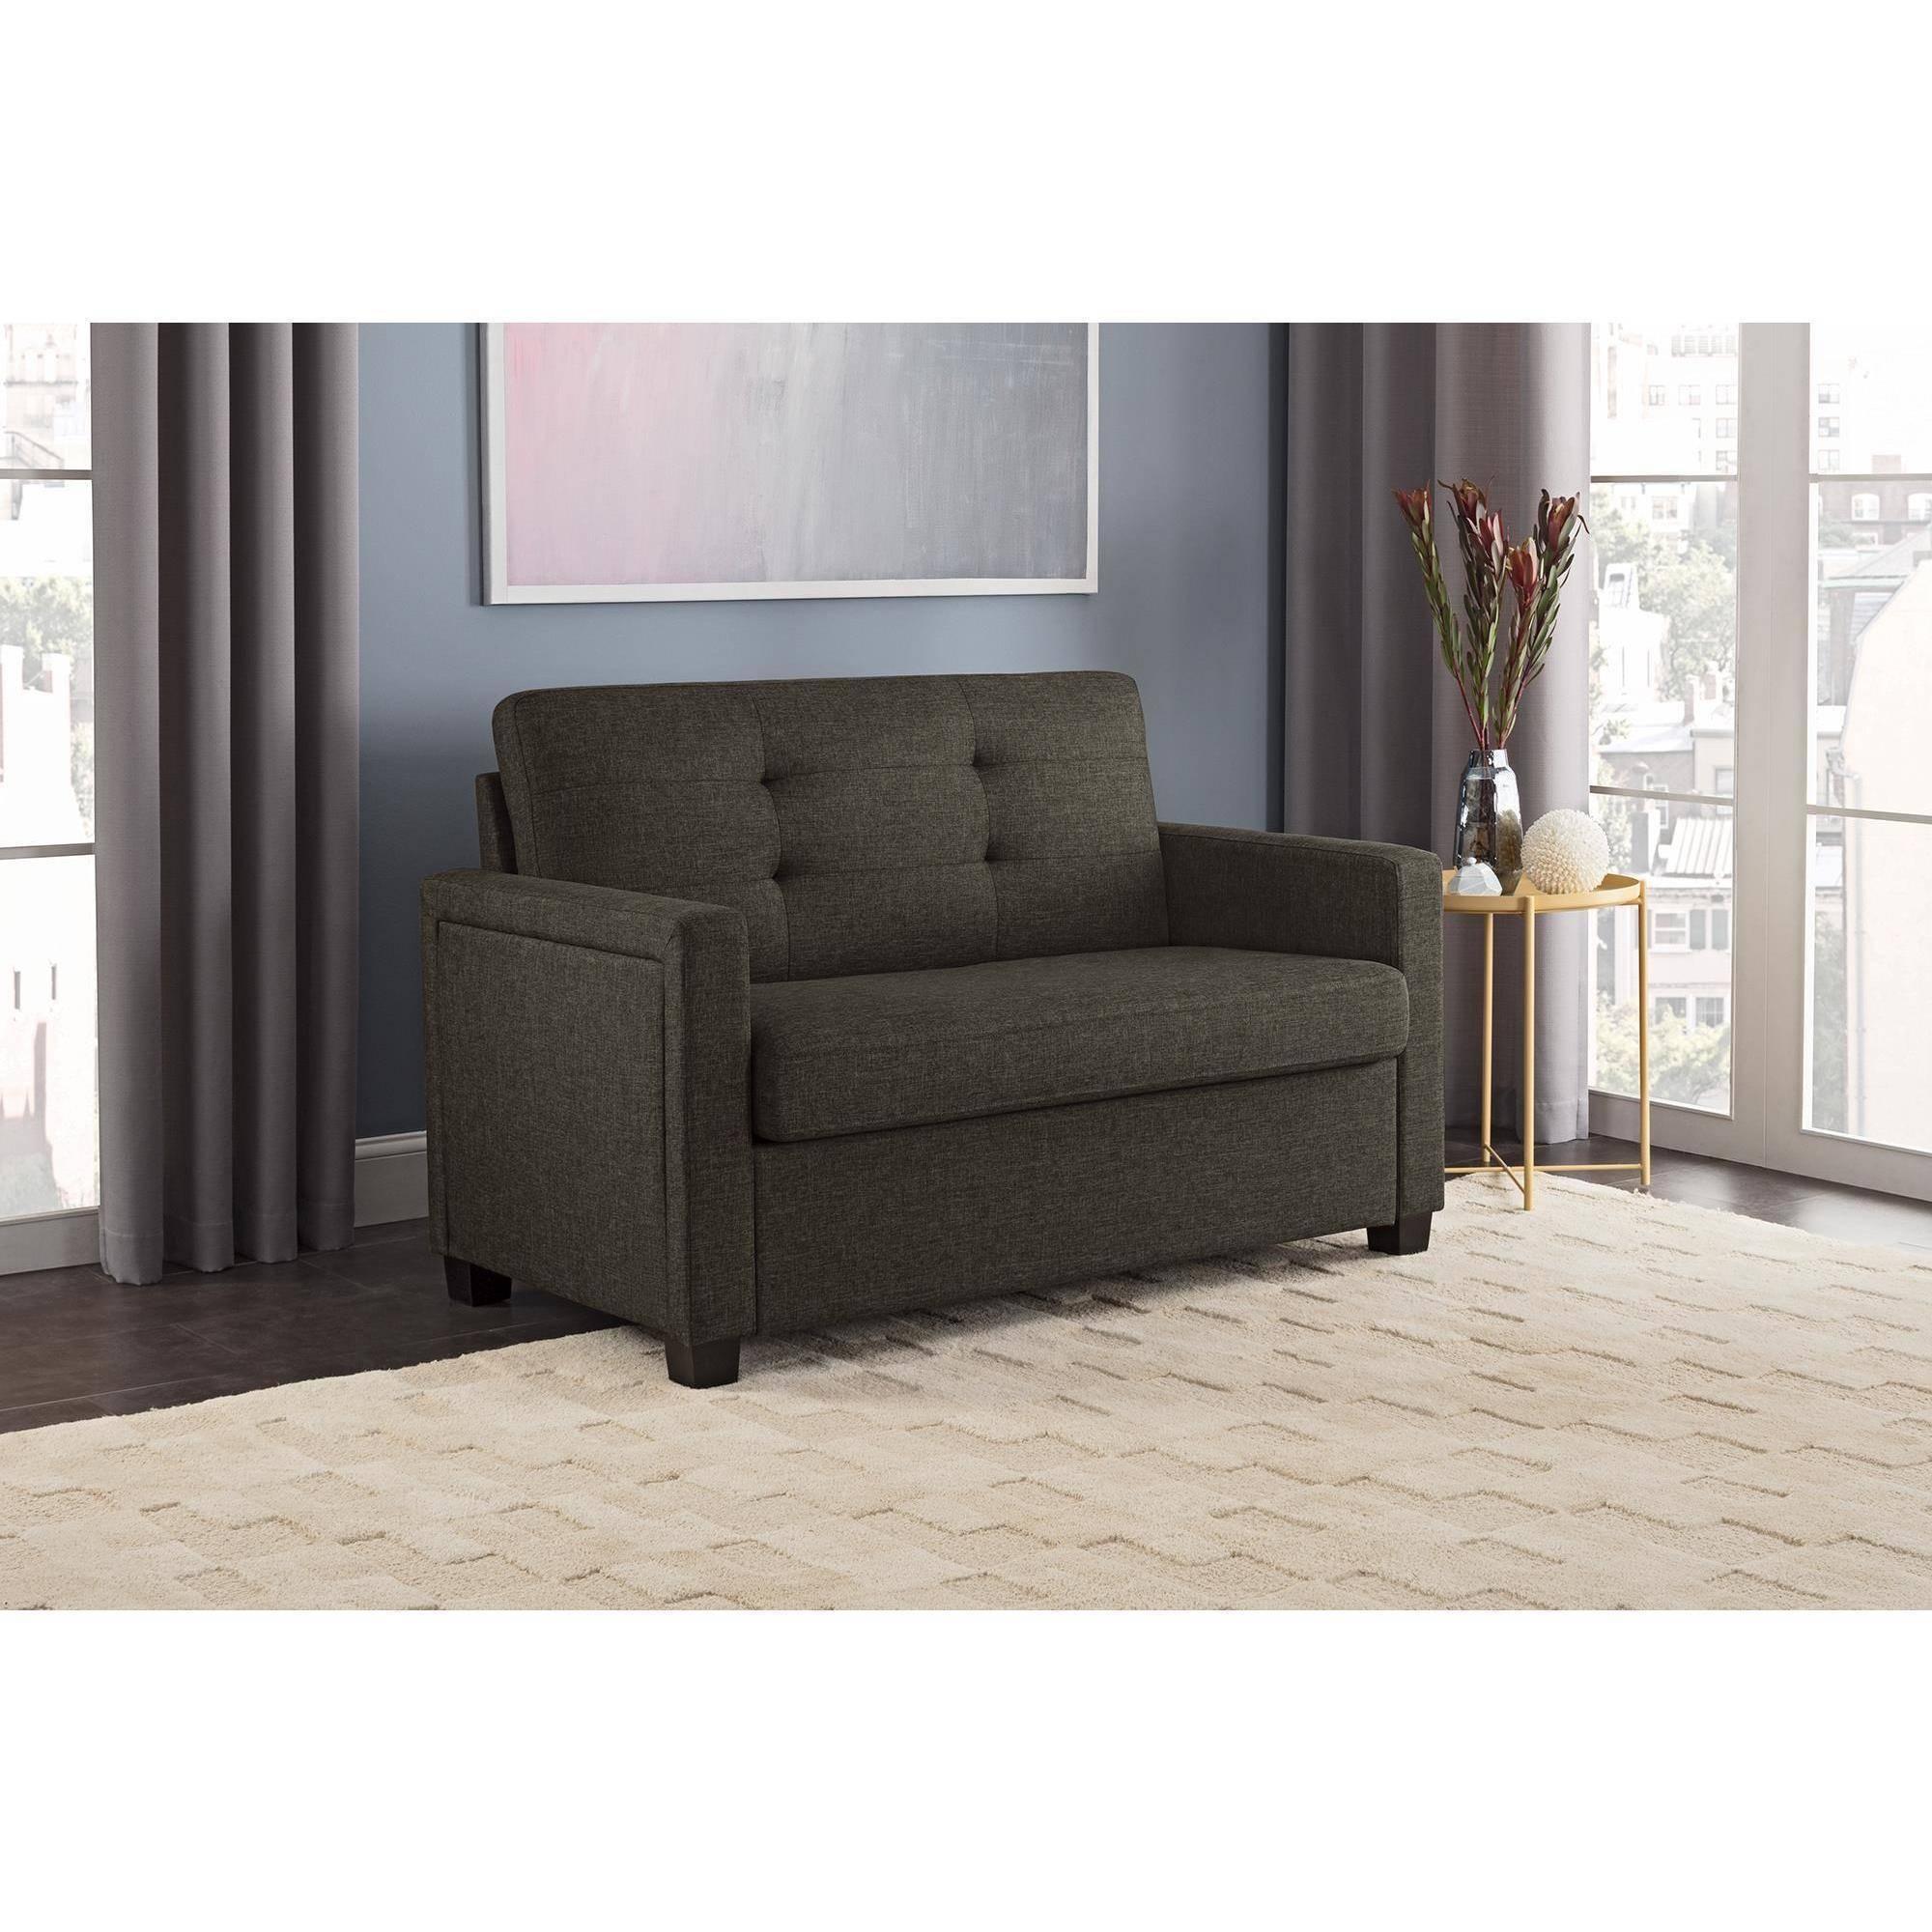 Sectional Sleeper Sofas regarding Sleeper Sectional Sofas (Image 13 of 30)